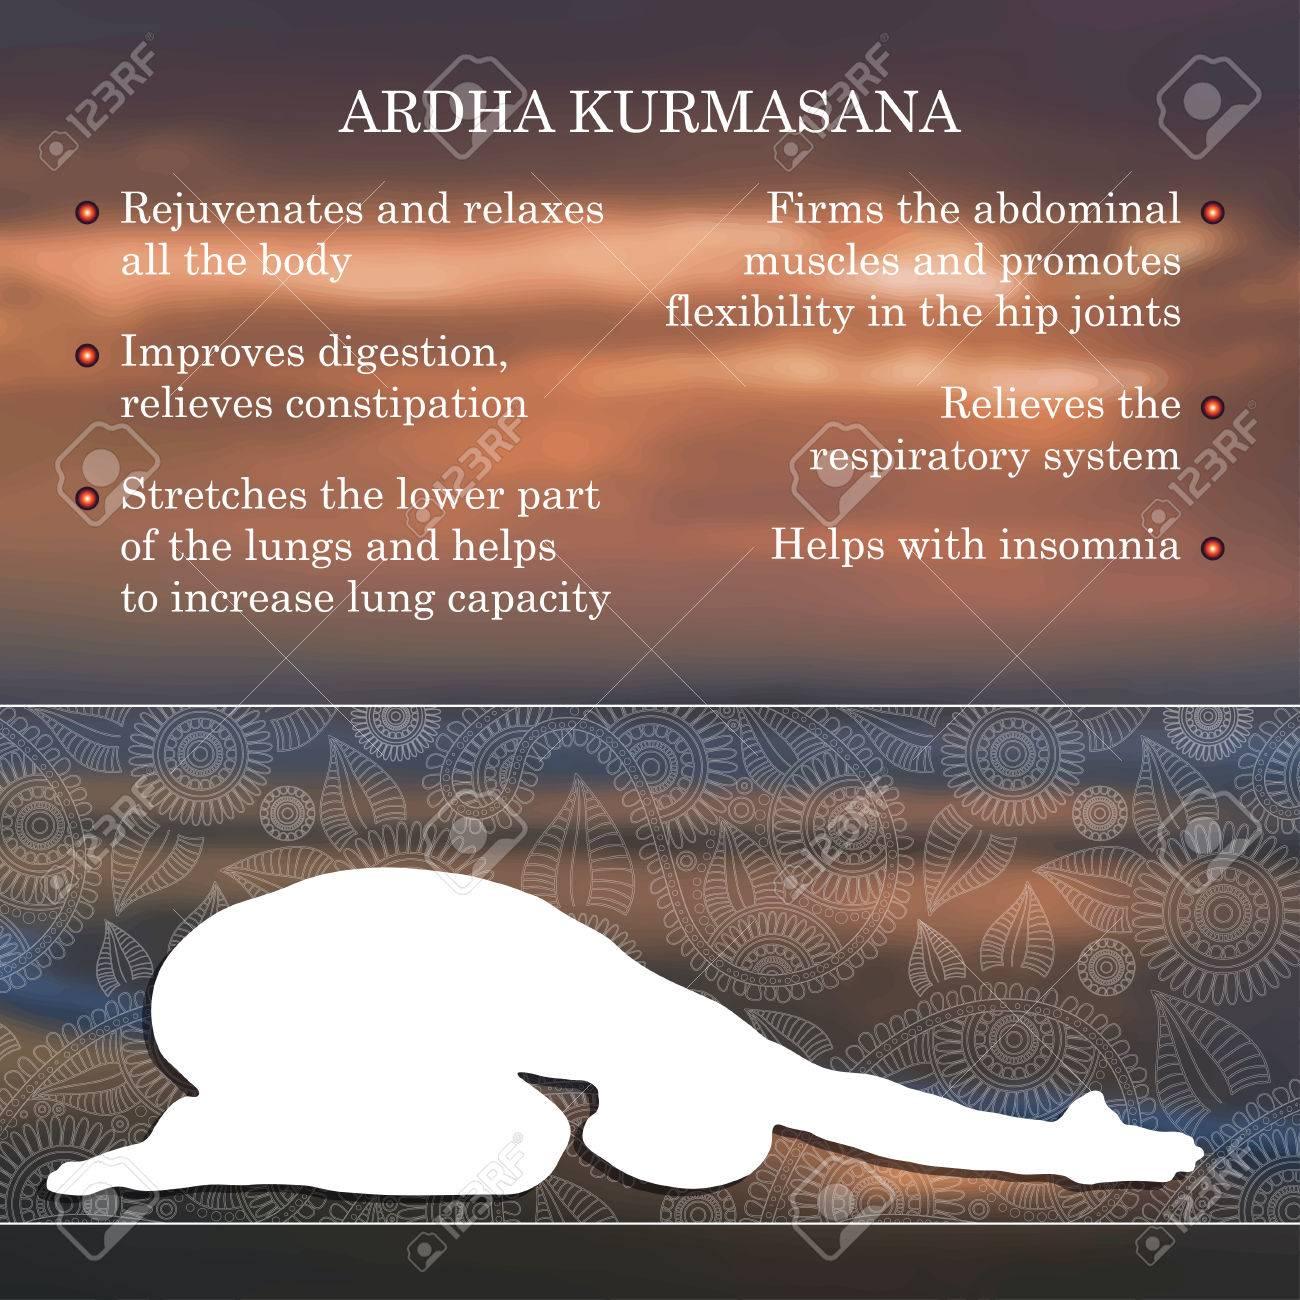 Kurmasana Benefits In English